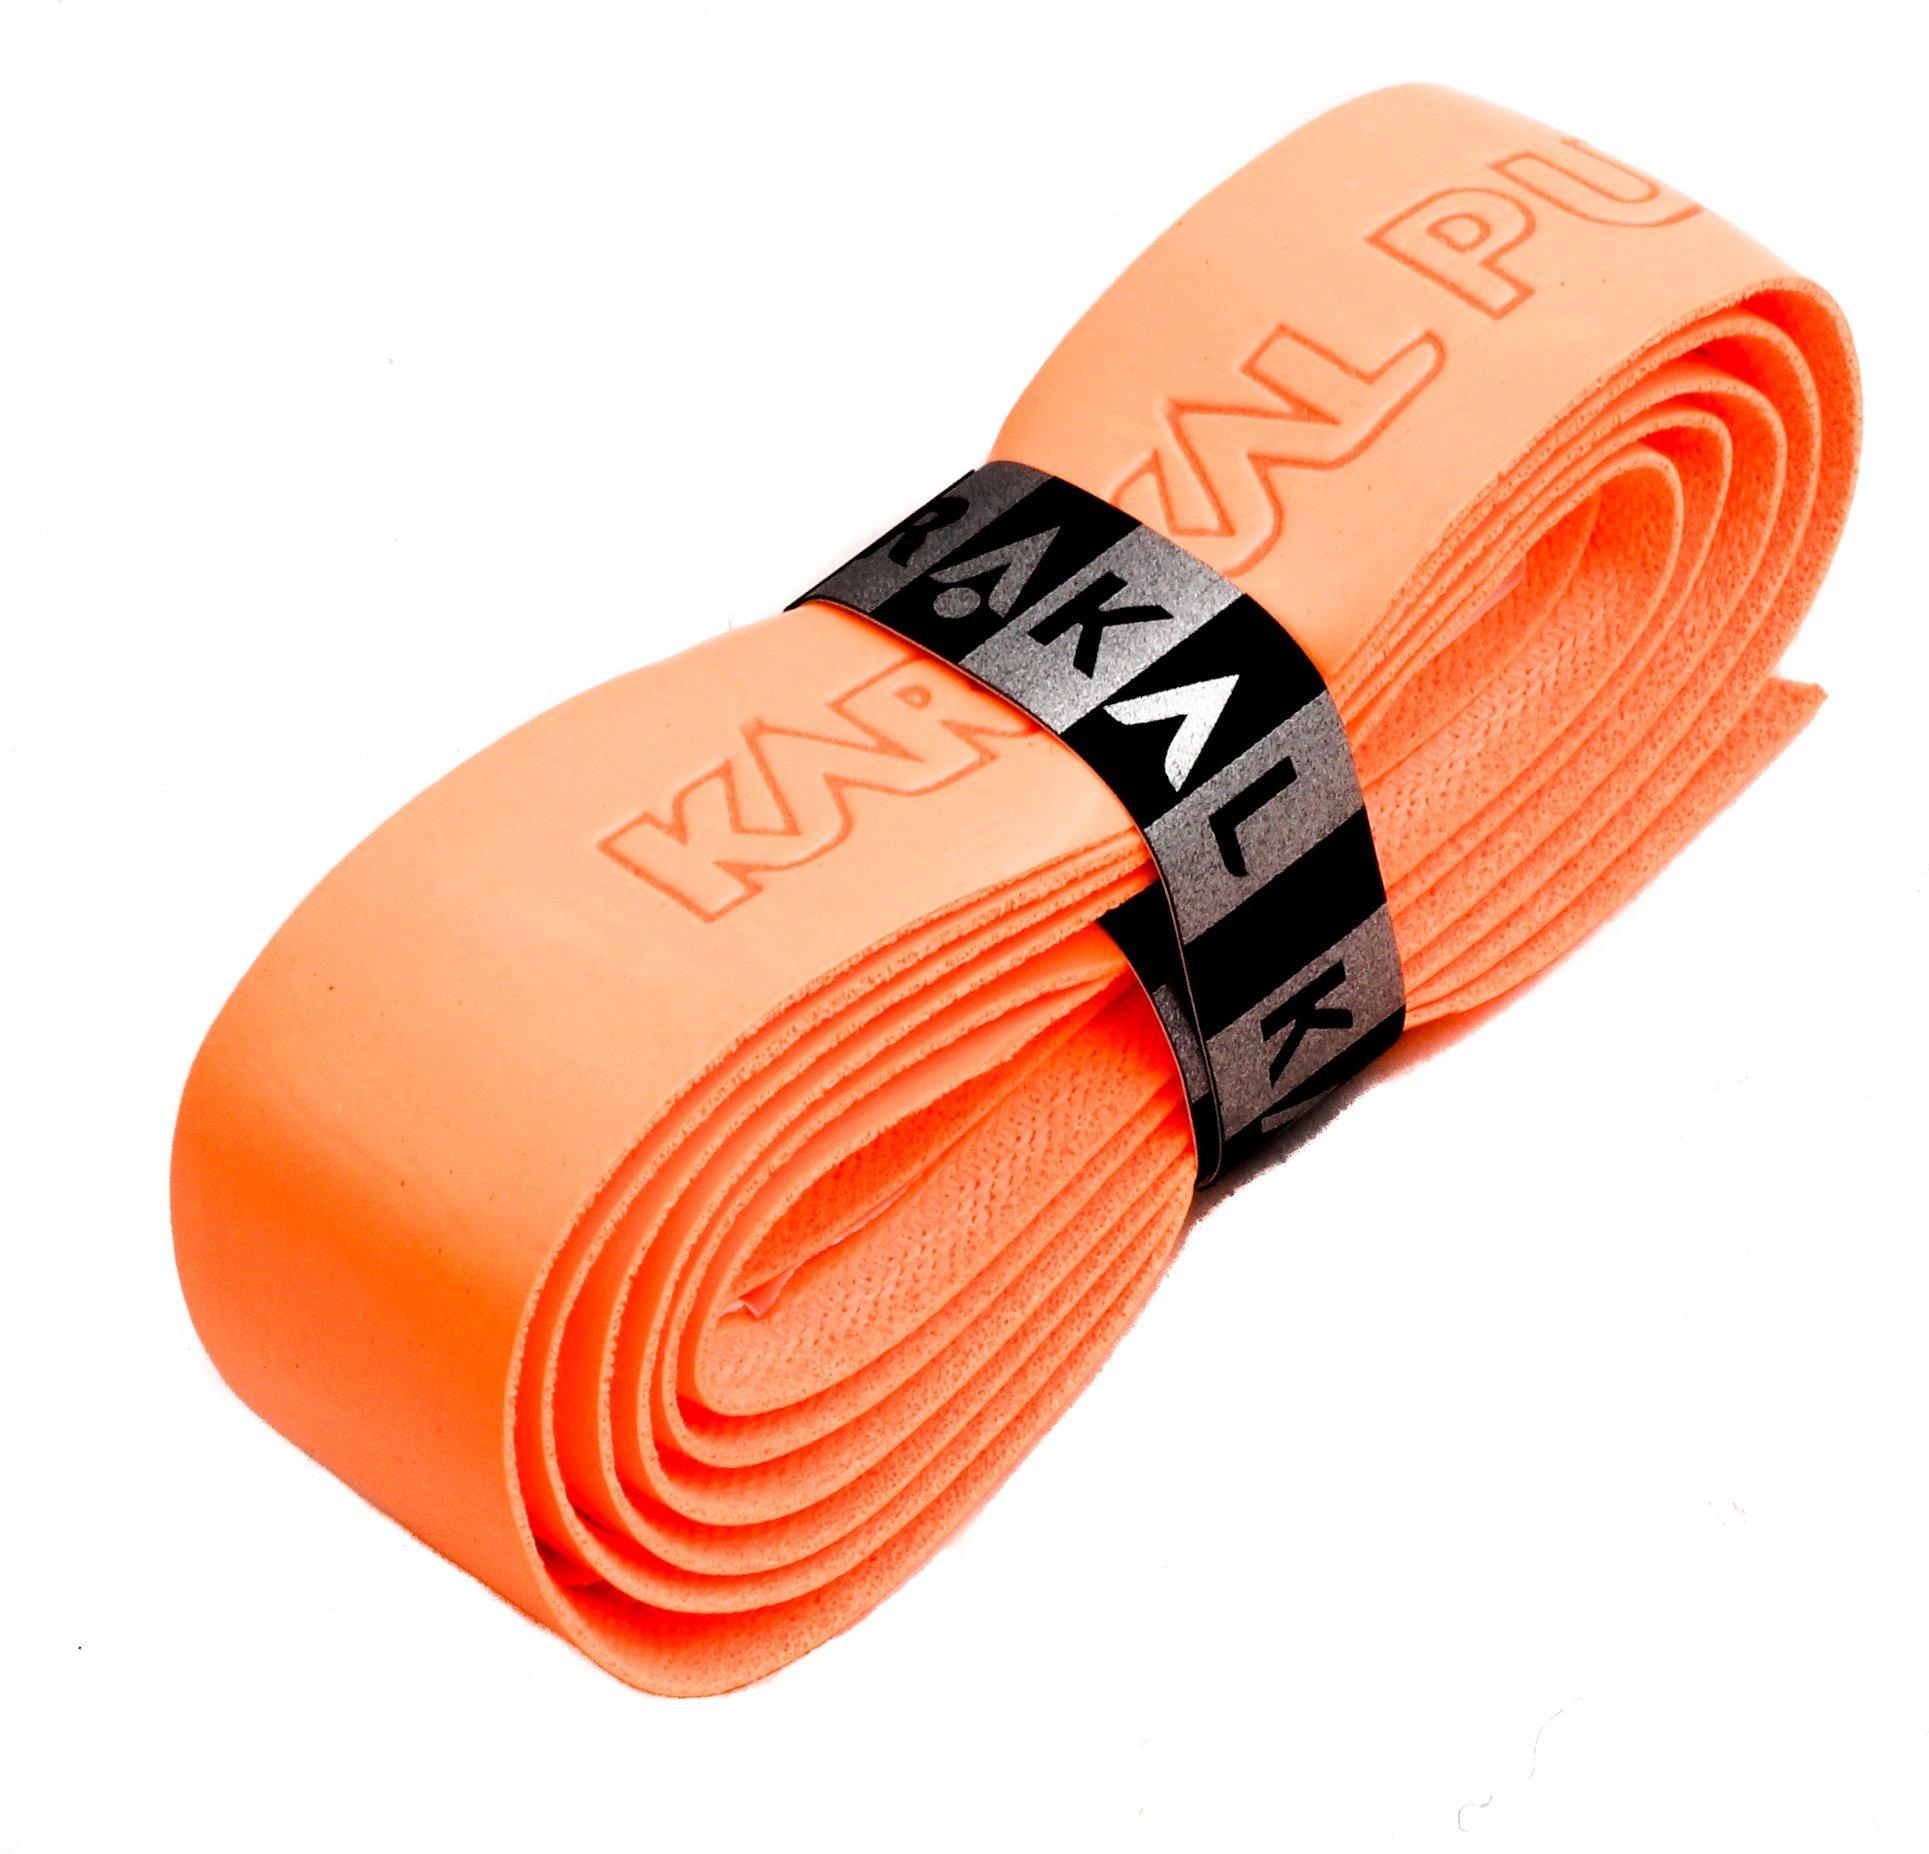 Karakal PU Supergrip replacement racquet grip - tennis / badminton / squash - fluorescent orange x 6 by Karakal